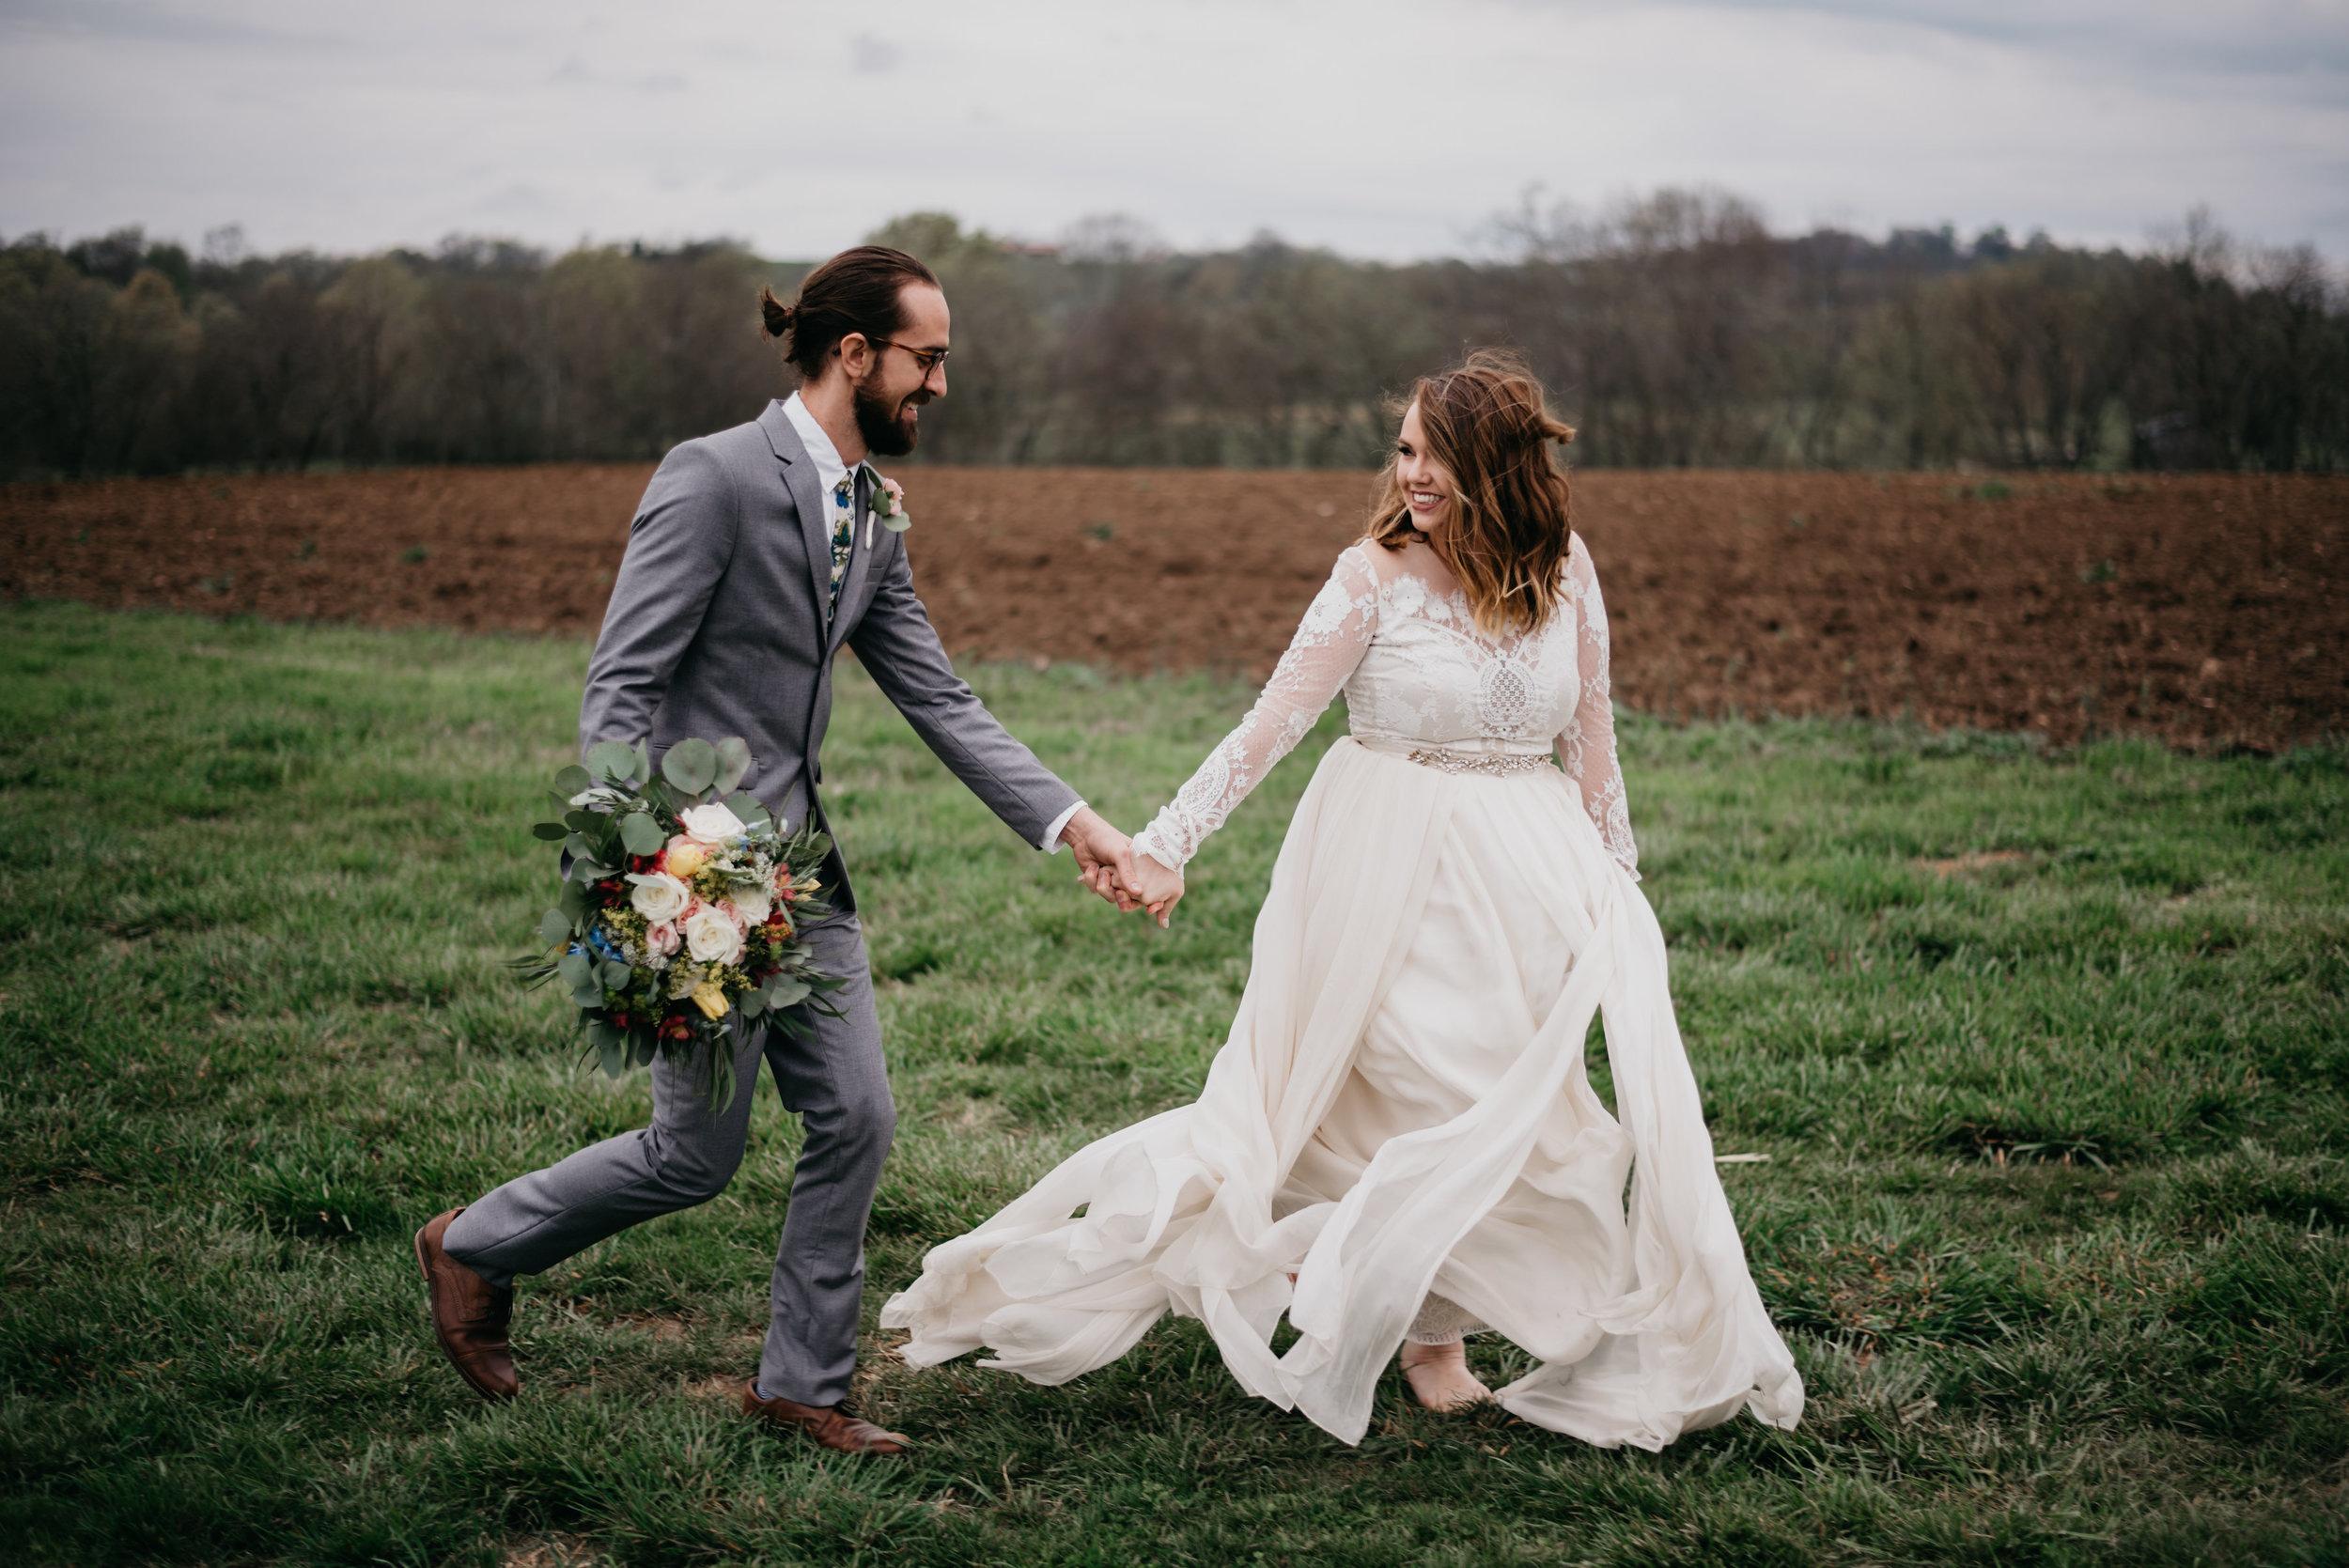 Allenbrooke-Farms-Nashville-Wedding-Photographers 31.jpg